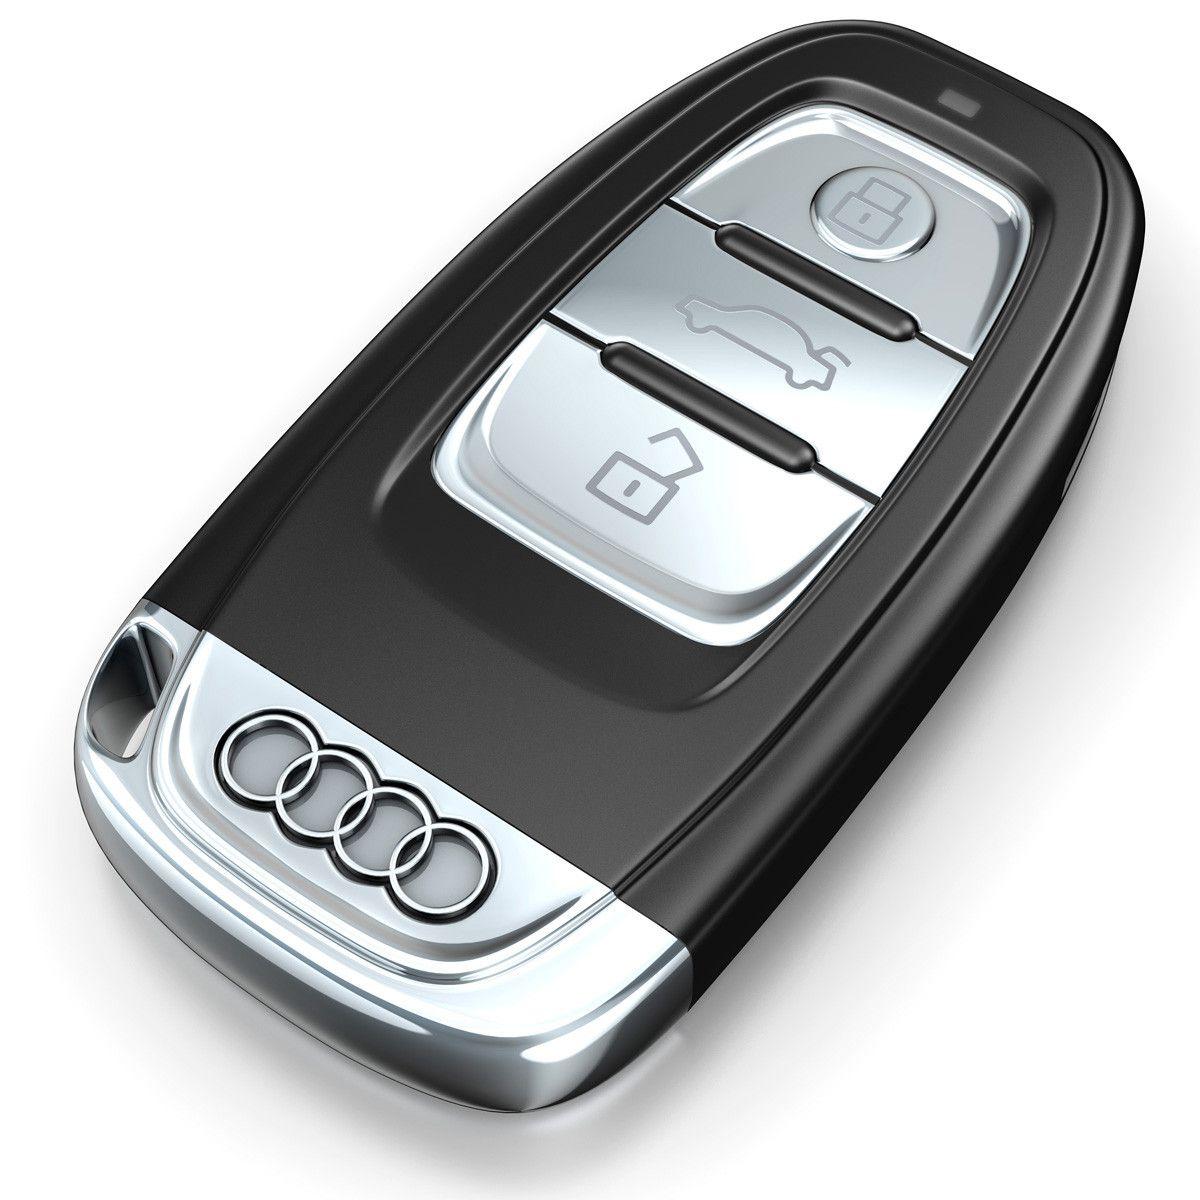 Audi Car Key Cd D Model DModeling Pinterest Car Keys - Audi car 3d games